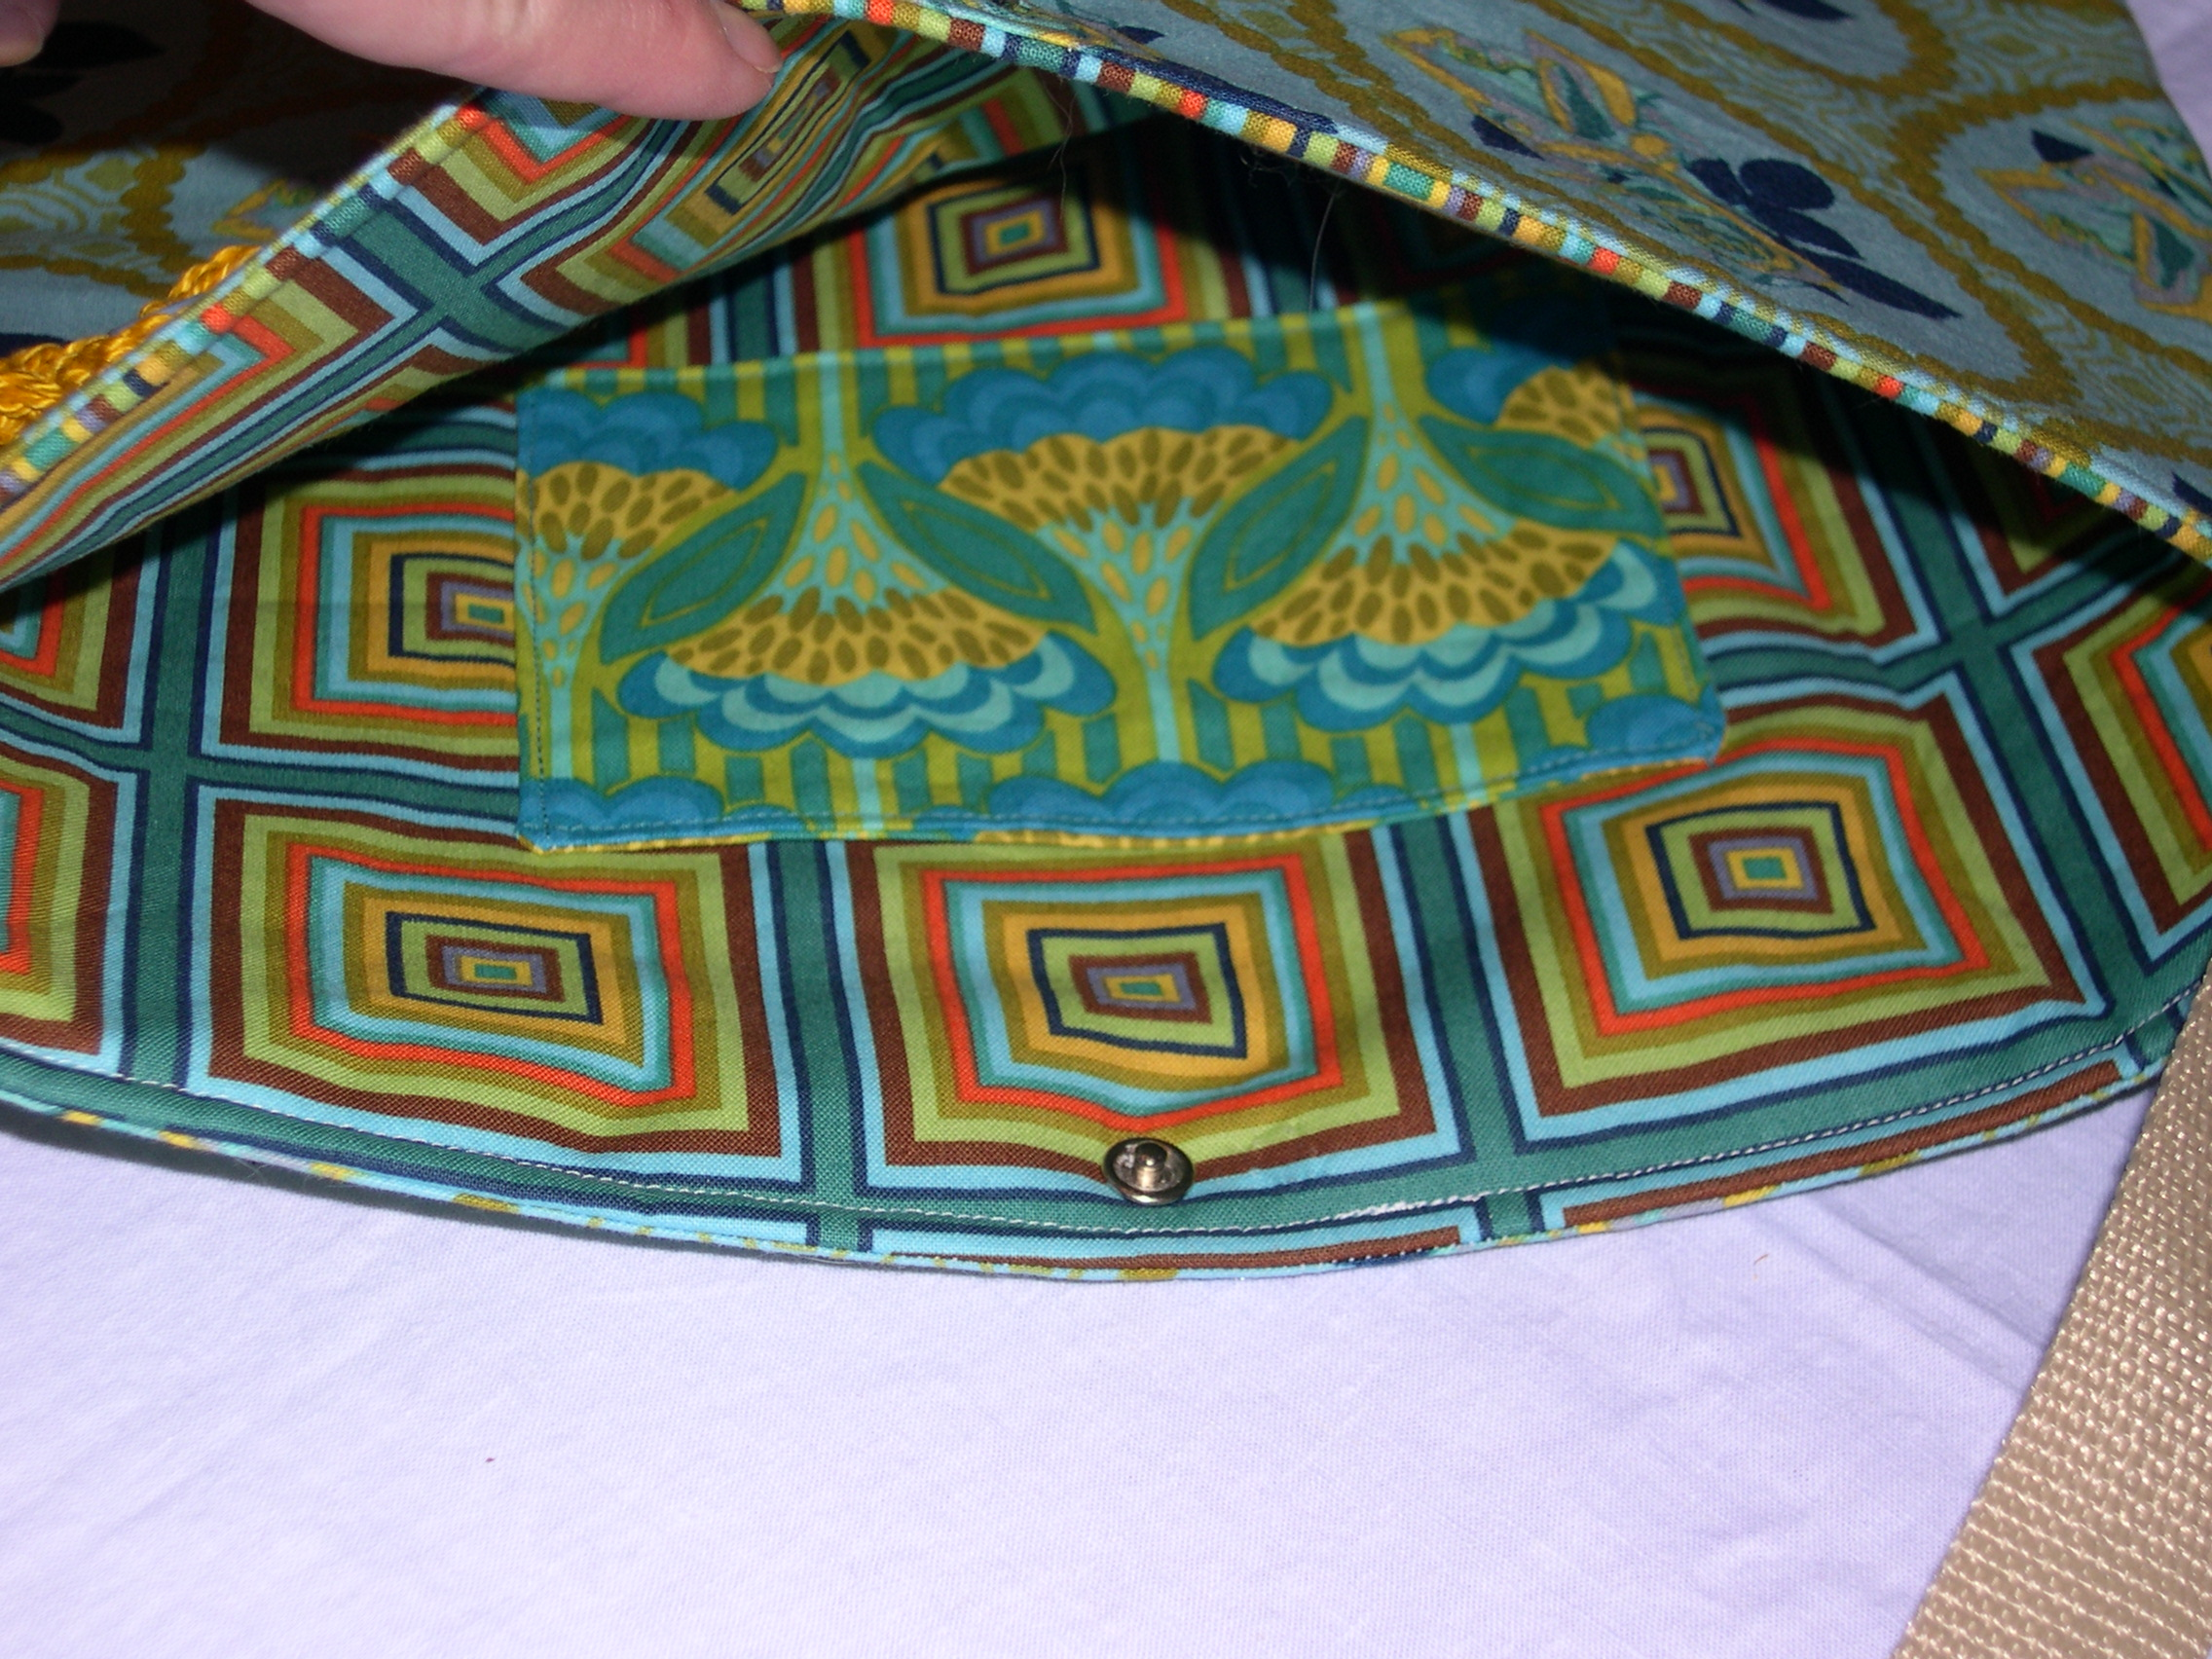 Book bag - inside